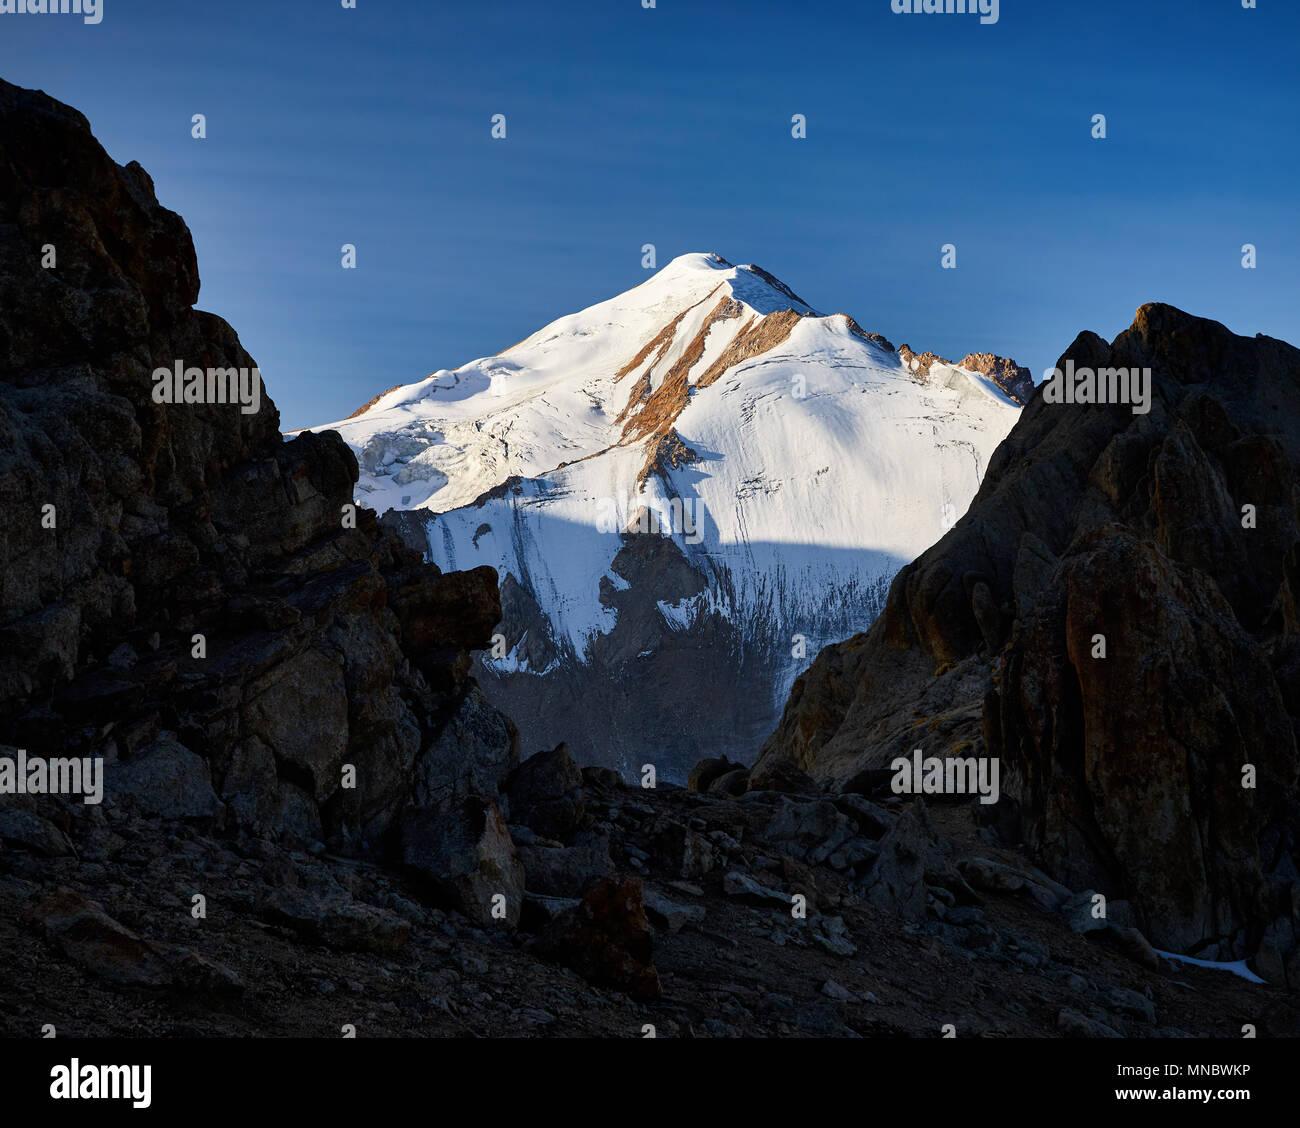 Grateful Snowy mount Sovetov between rocks silhouette at sunrise in Tyan Shan mountain range in Kazakhstan - Stock Image